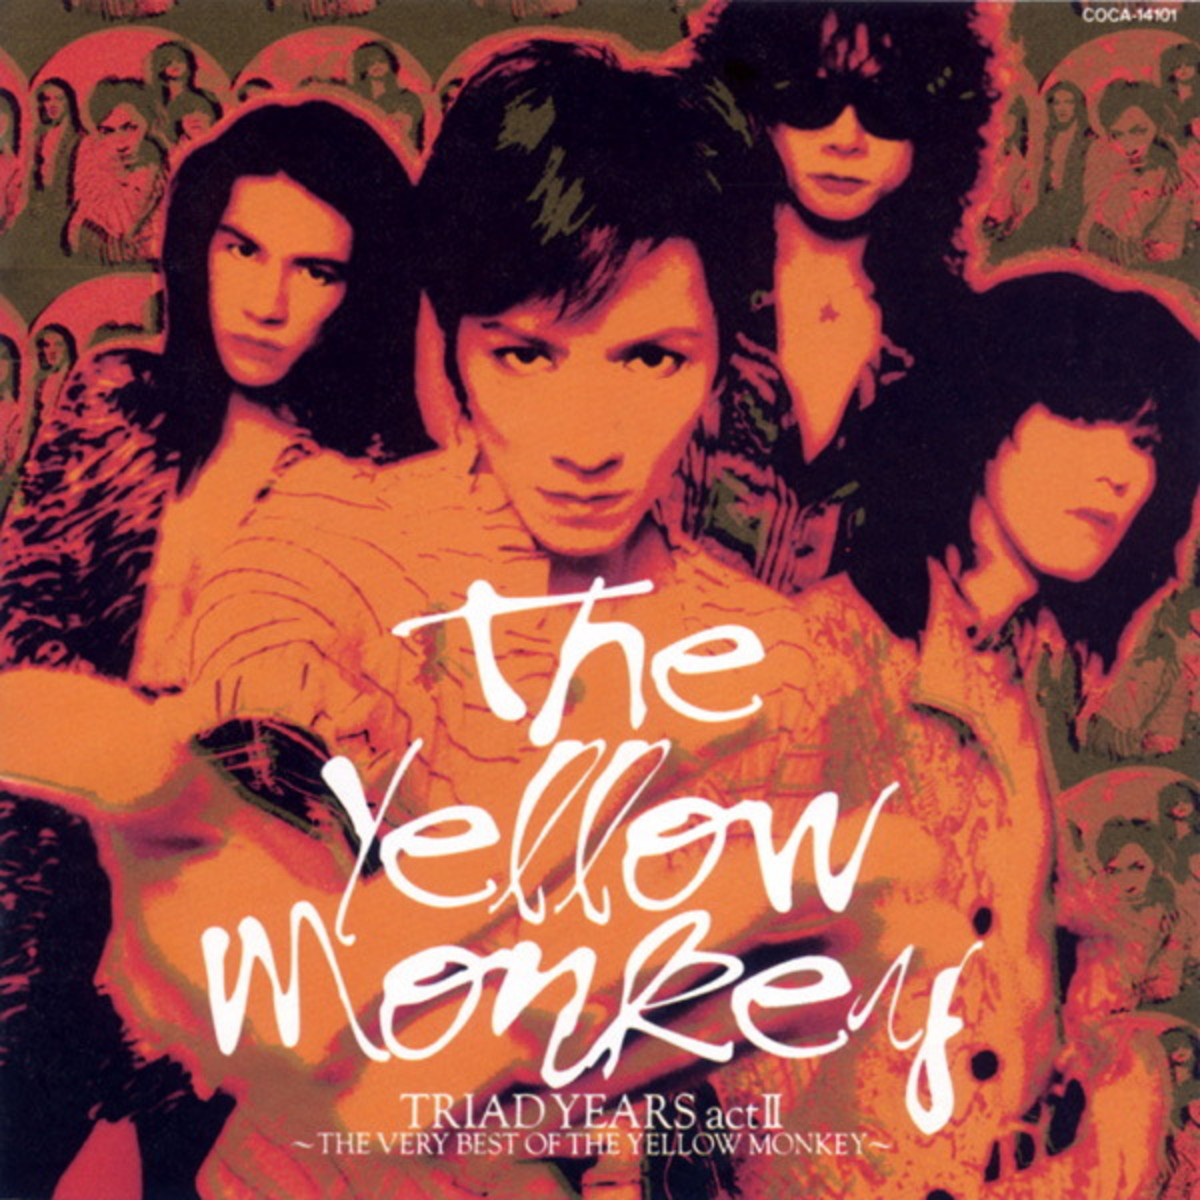 The Yellow Monkeyの画像 原寸画像検索